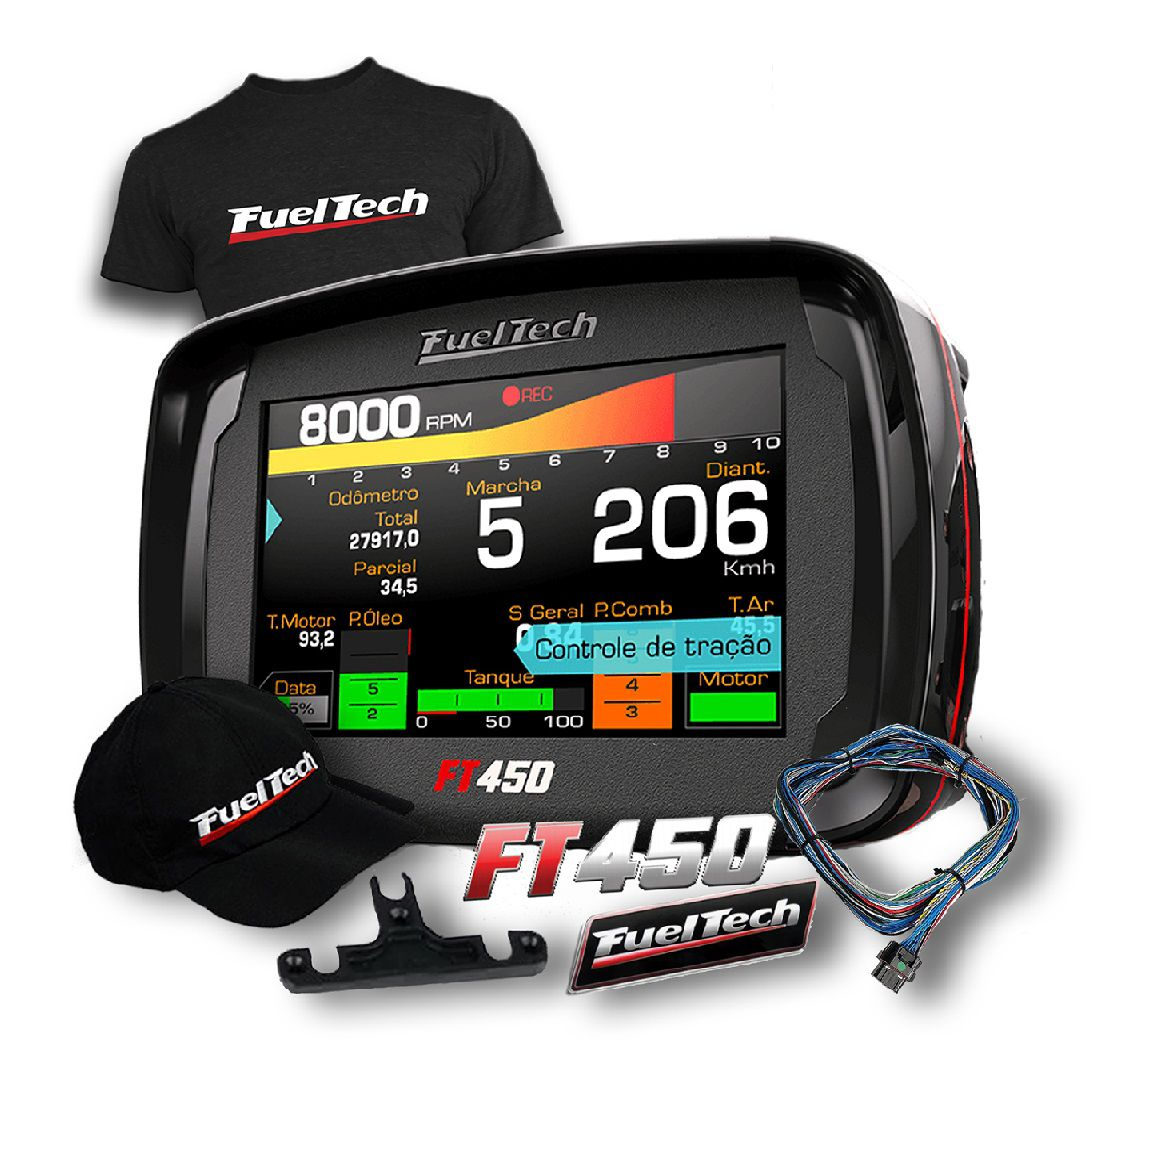 Fueltech FT 450 +ultra Brindes+ 12x S/juros PRONTA ENTREGA